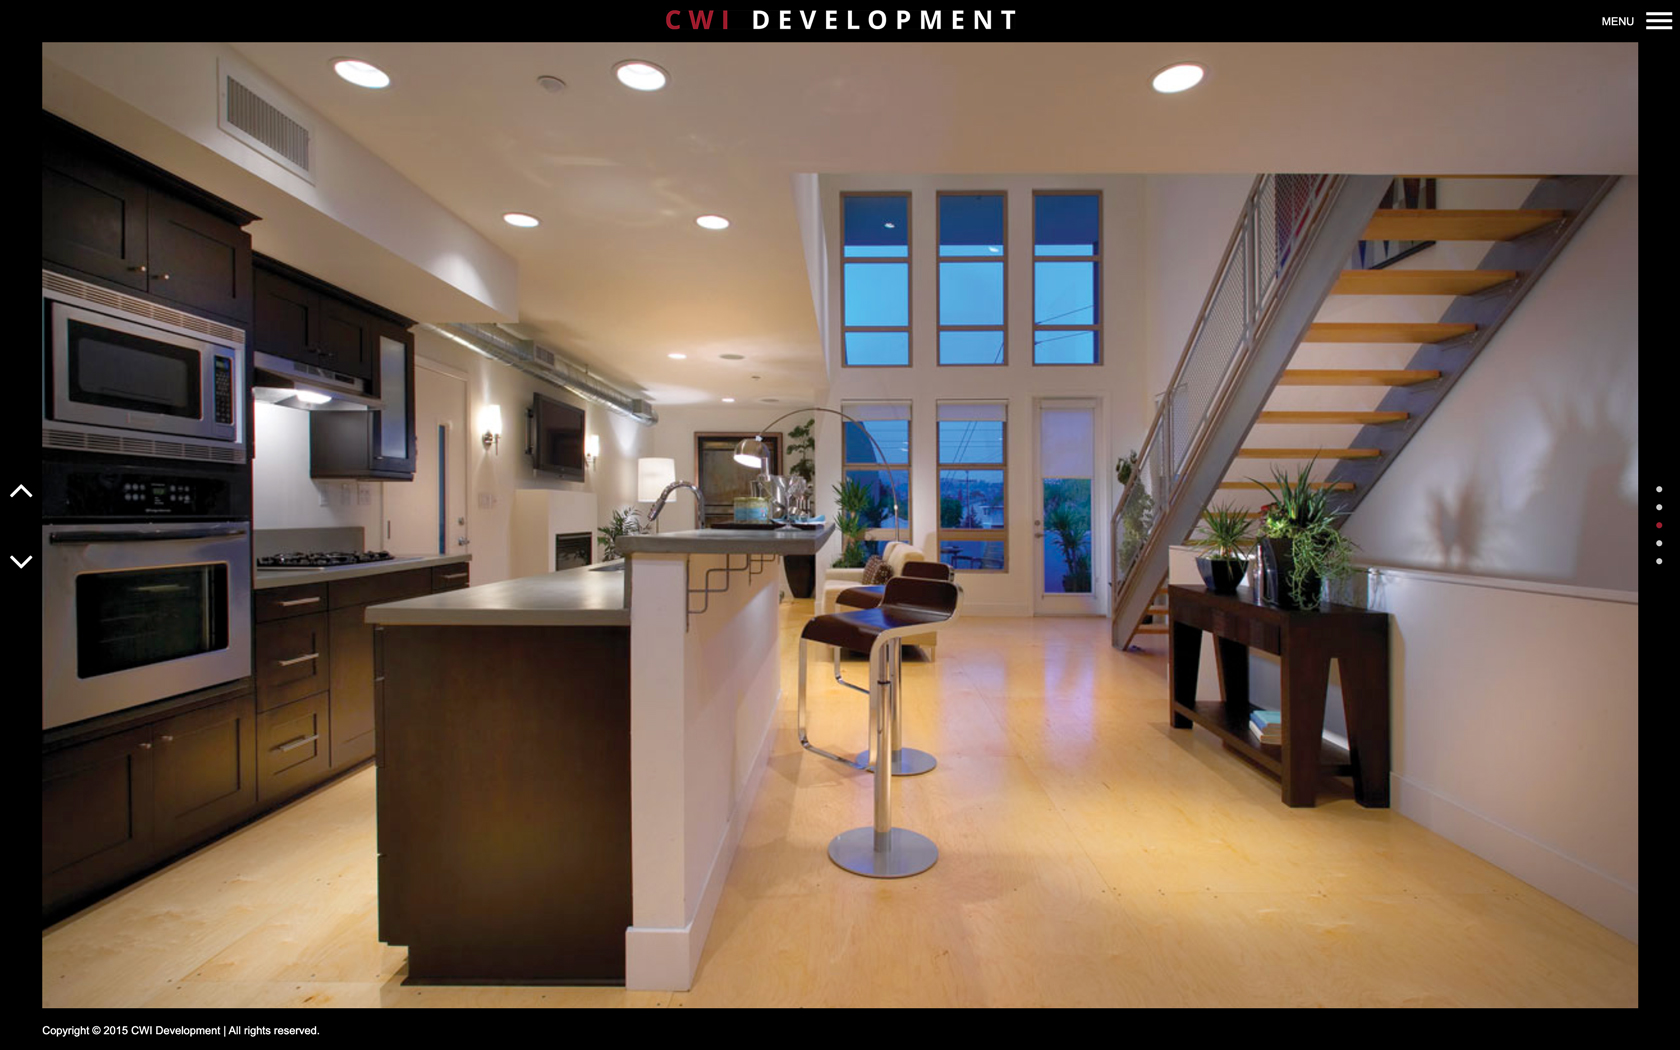 CWI Development